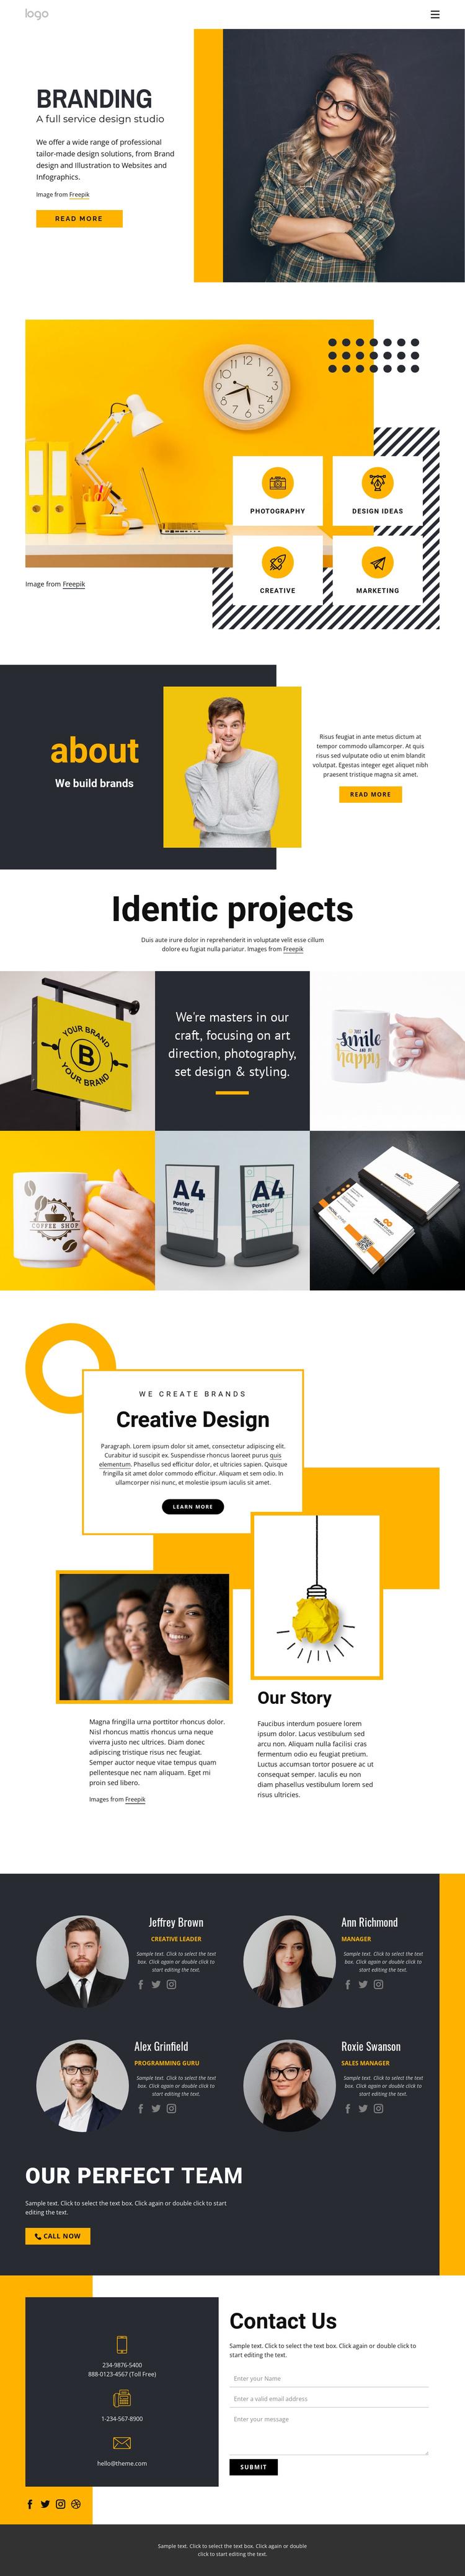 Full-service design studio Joomla Template